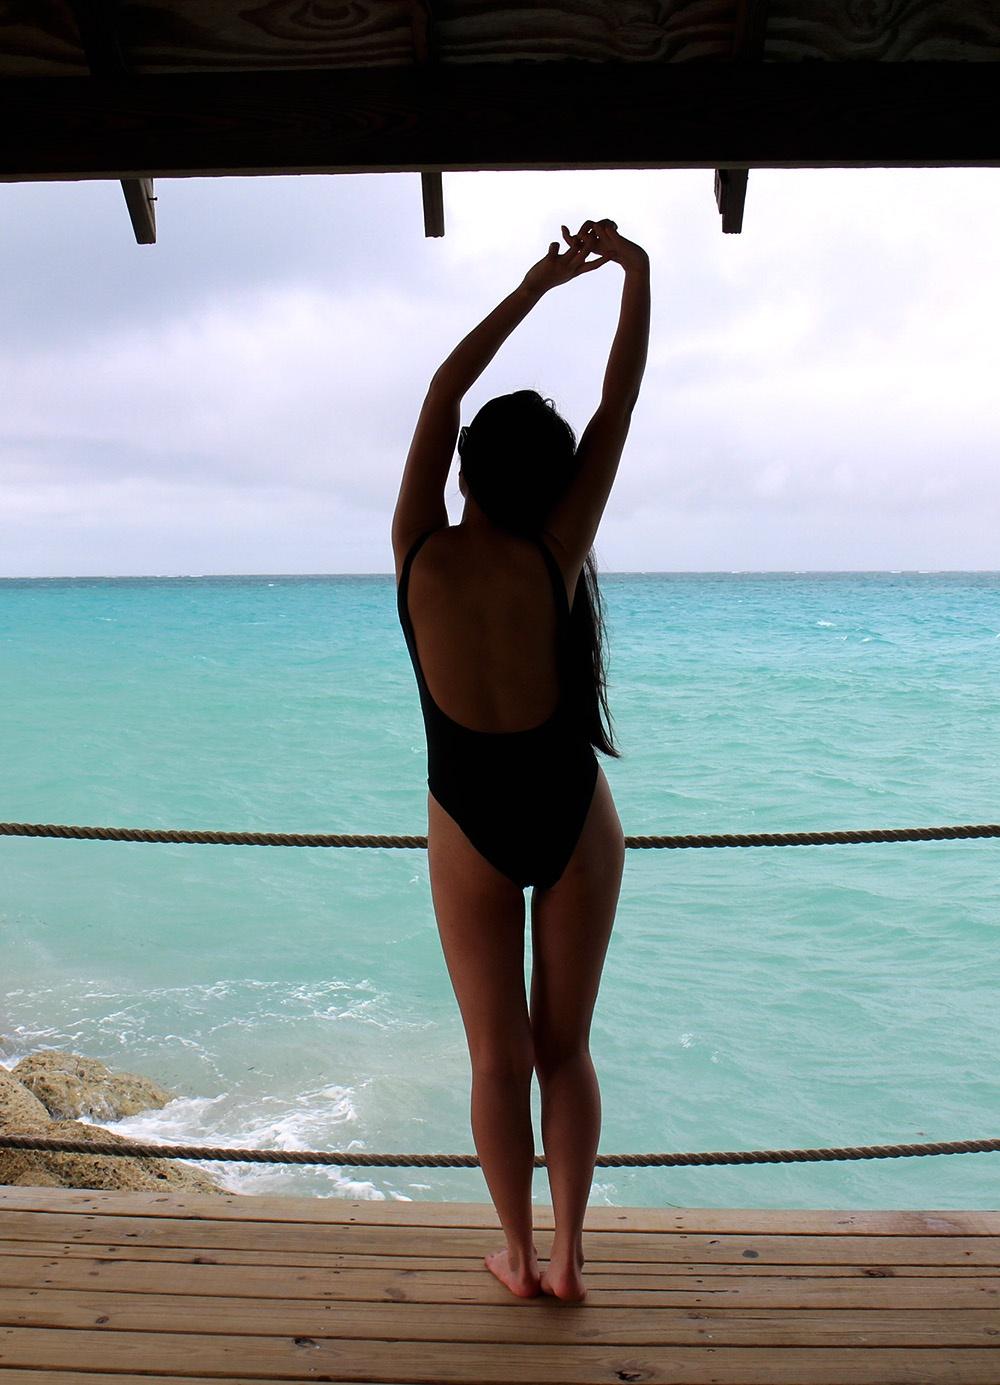 Bahamas_beach_04